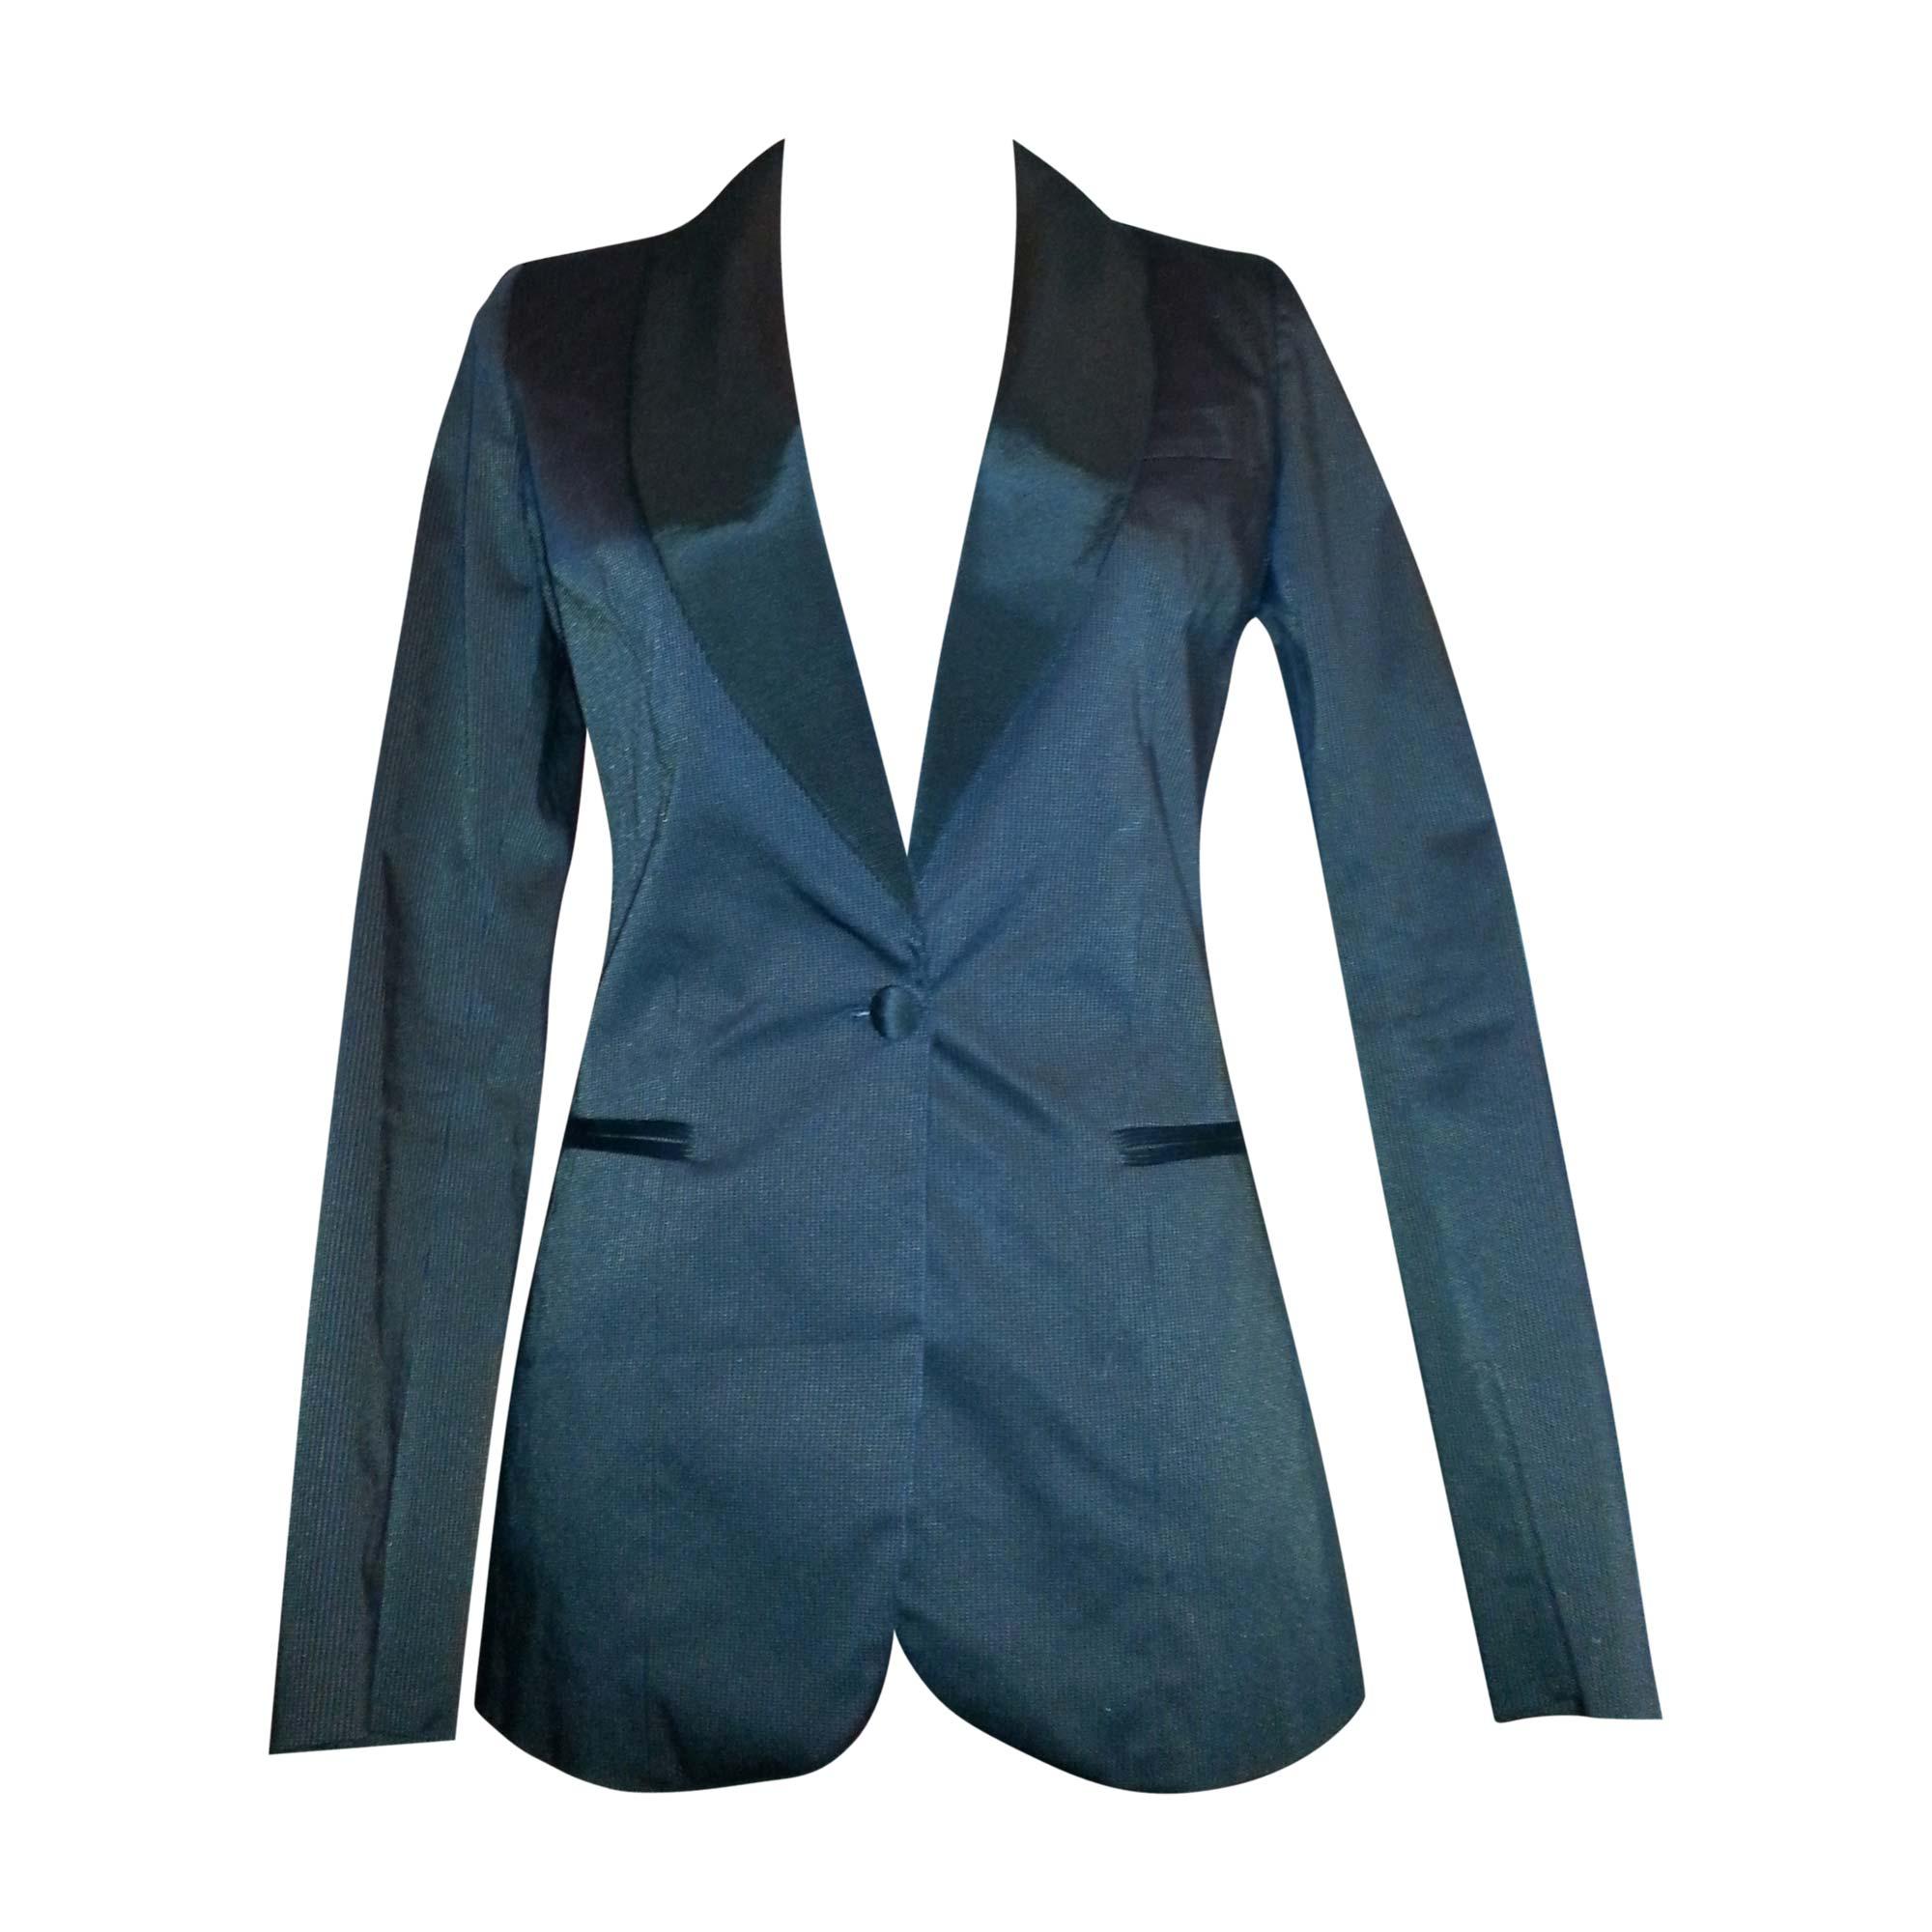 Blazer, veste tailleur PAUL & JOE Noir